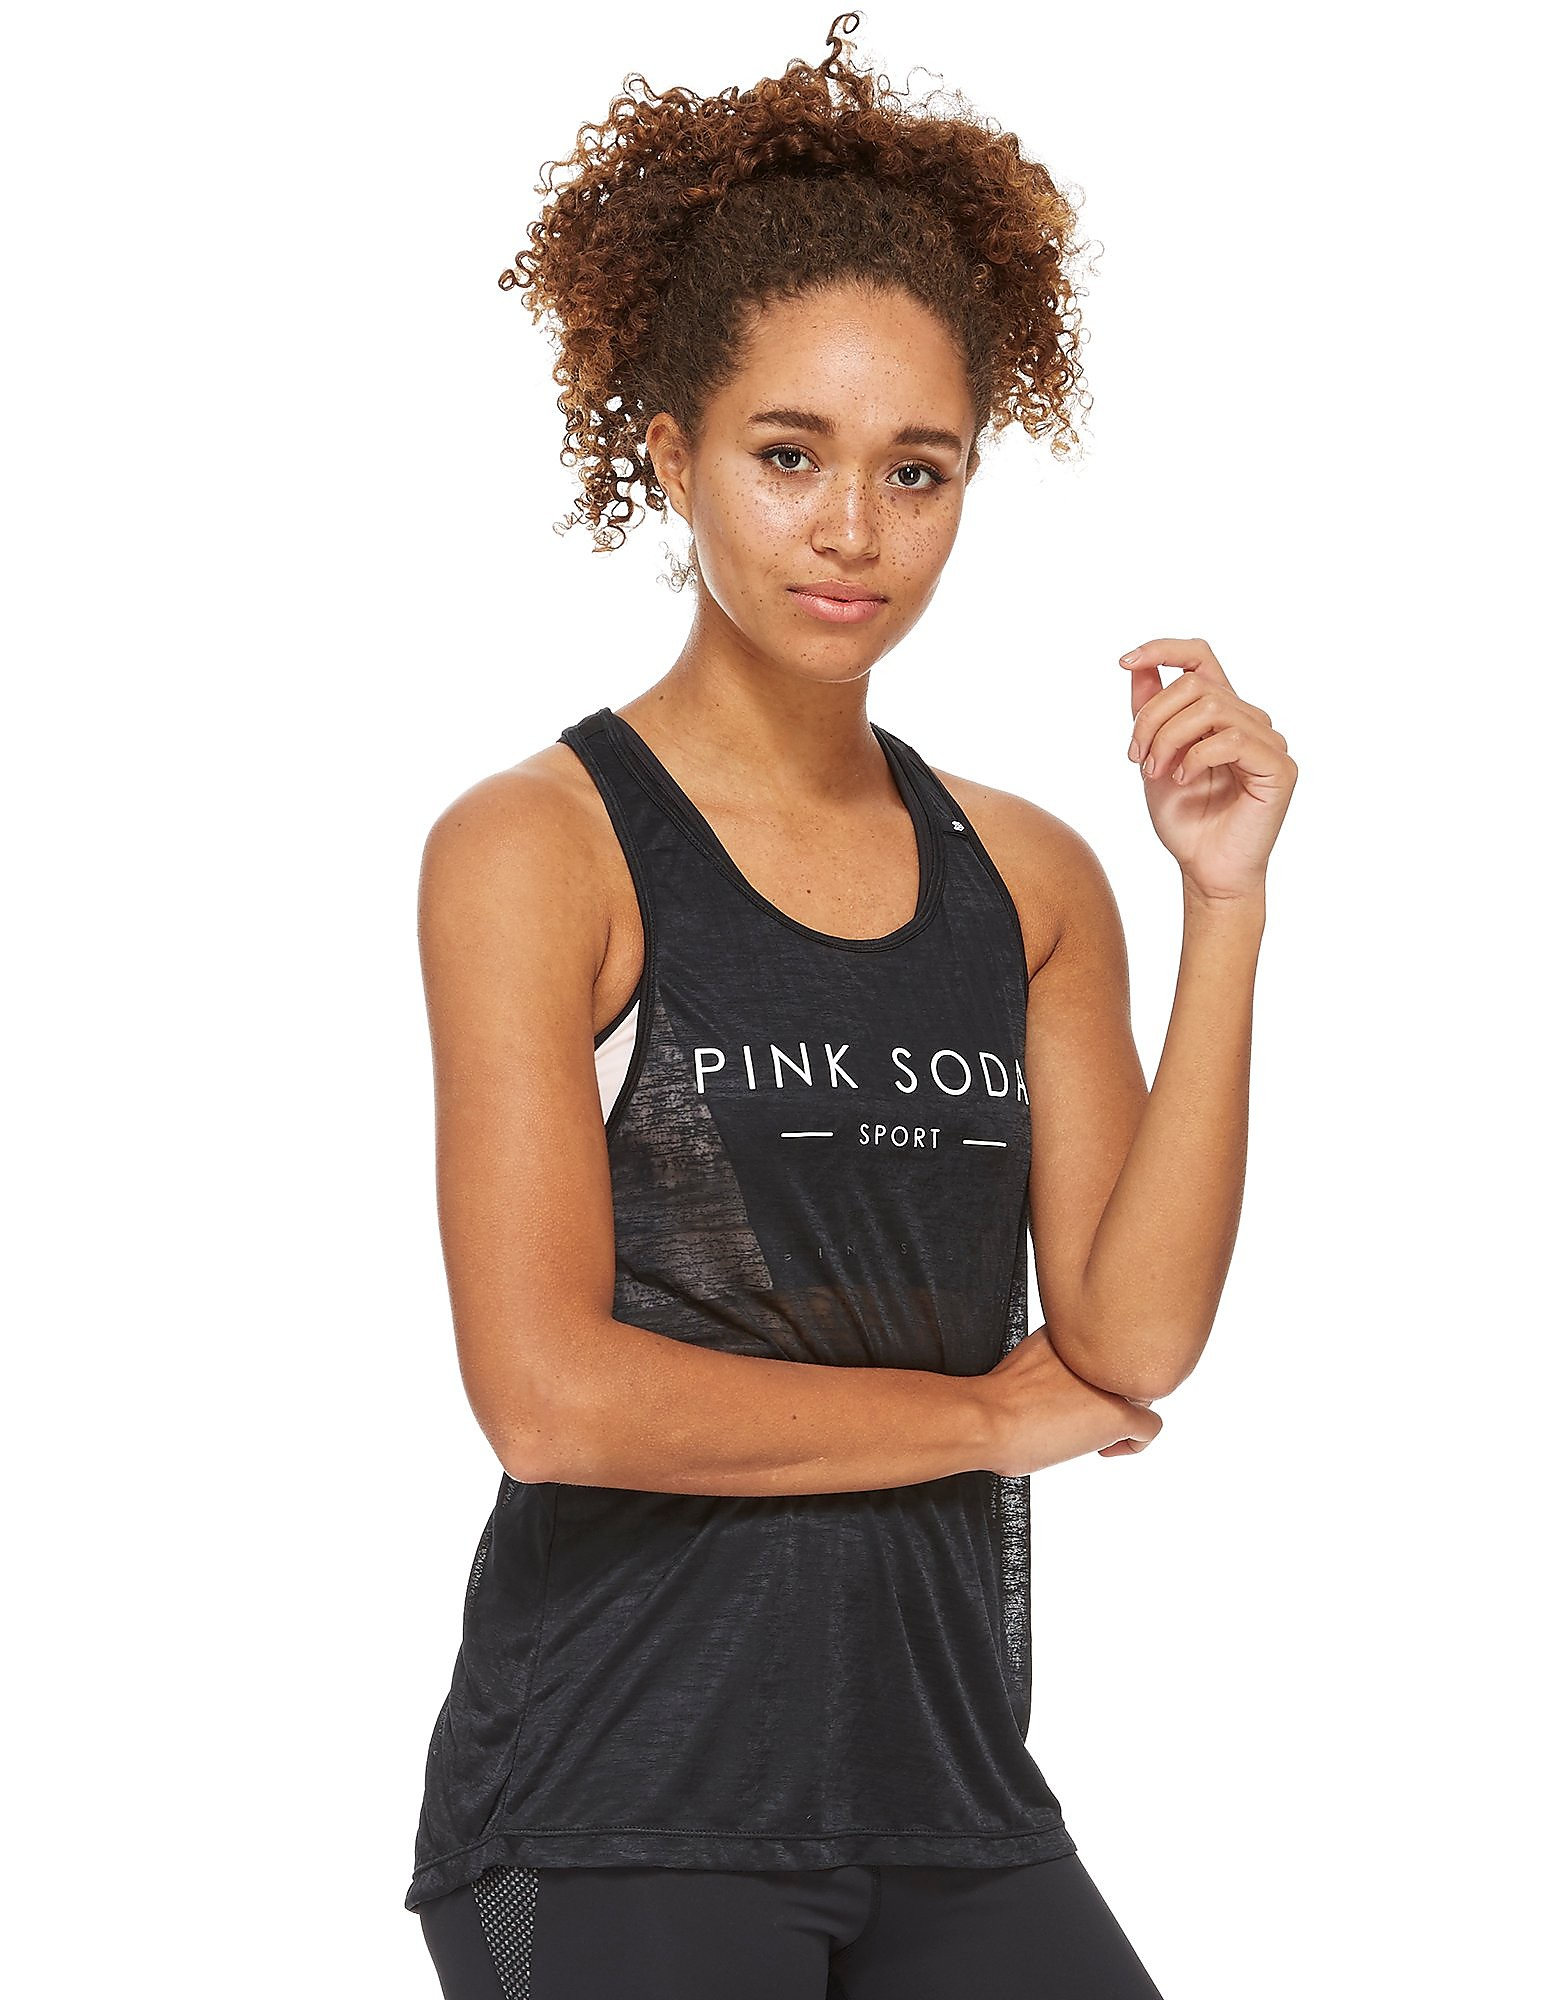 Pink Soda Sport Reps Tank Top